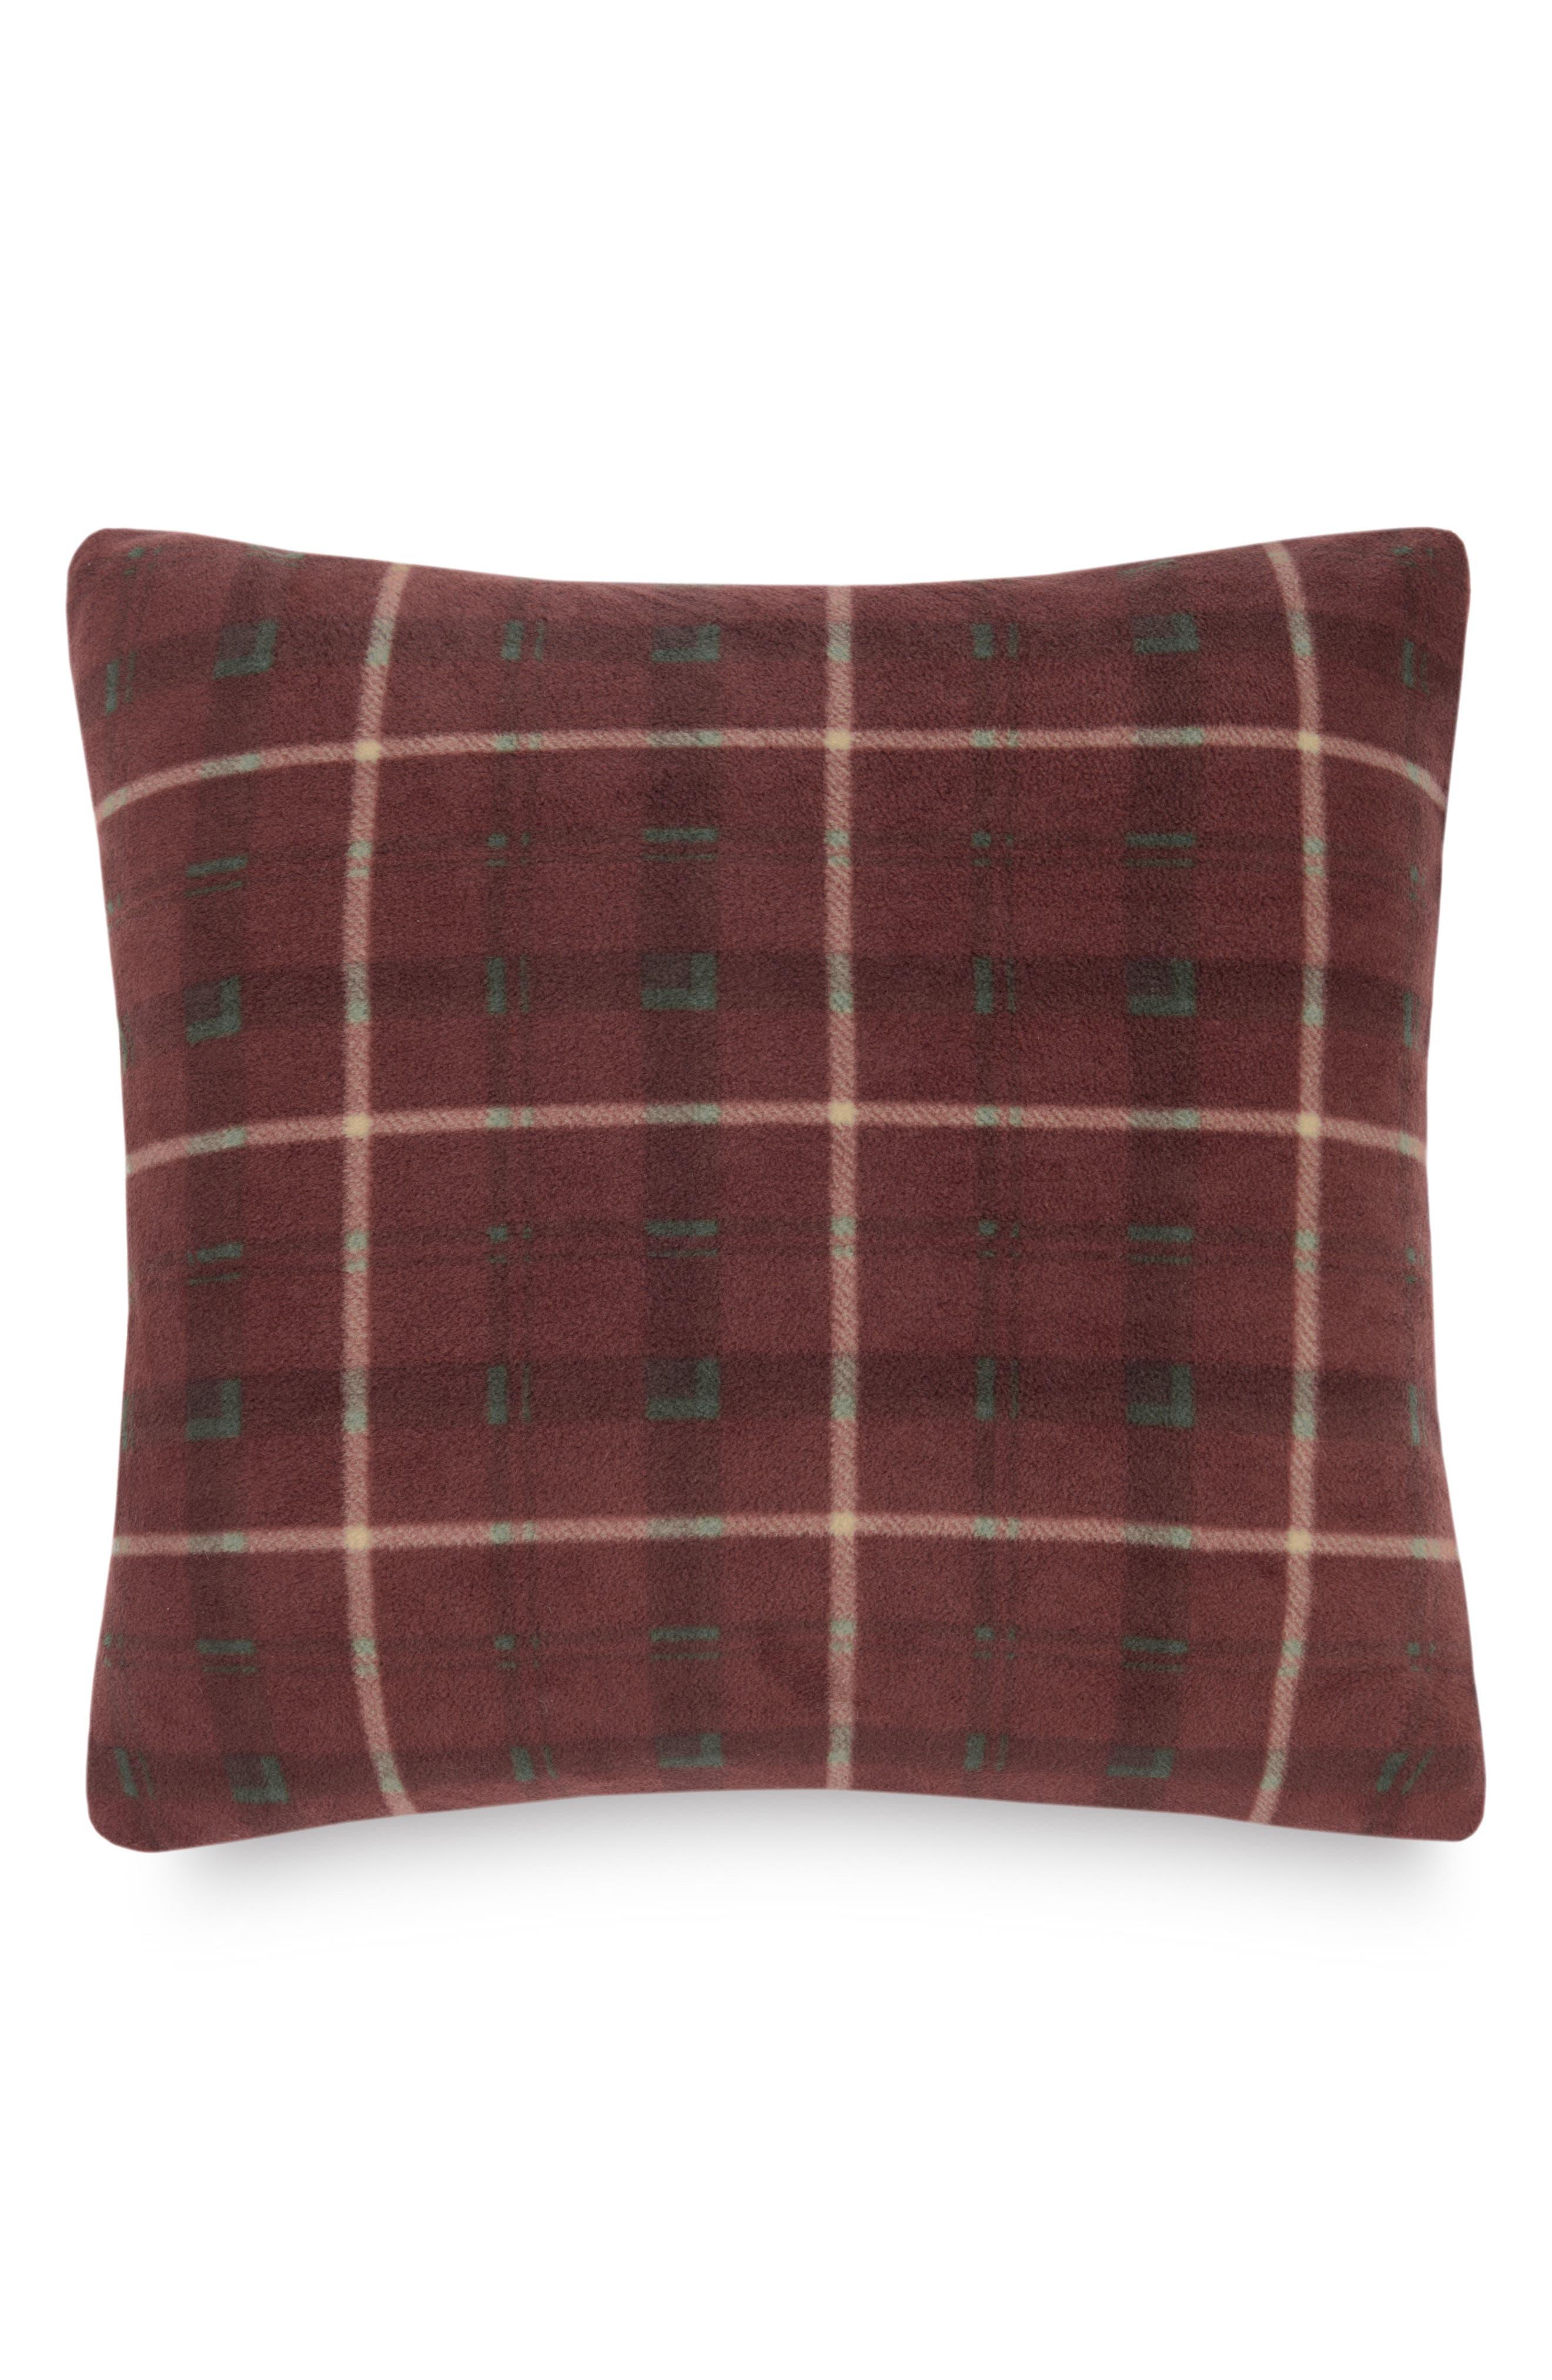 Alternate Image 1 Selected - Pendleton Plaid Fleece Pillow